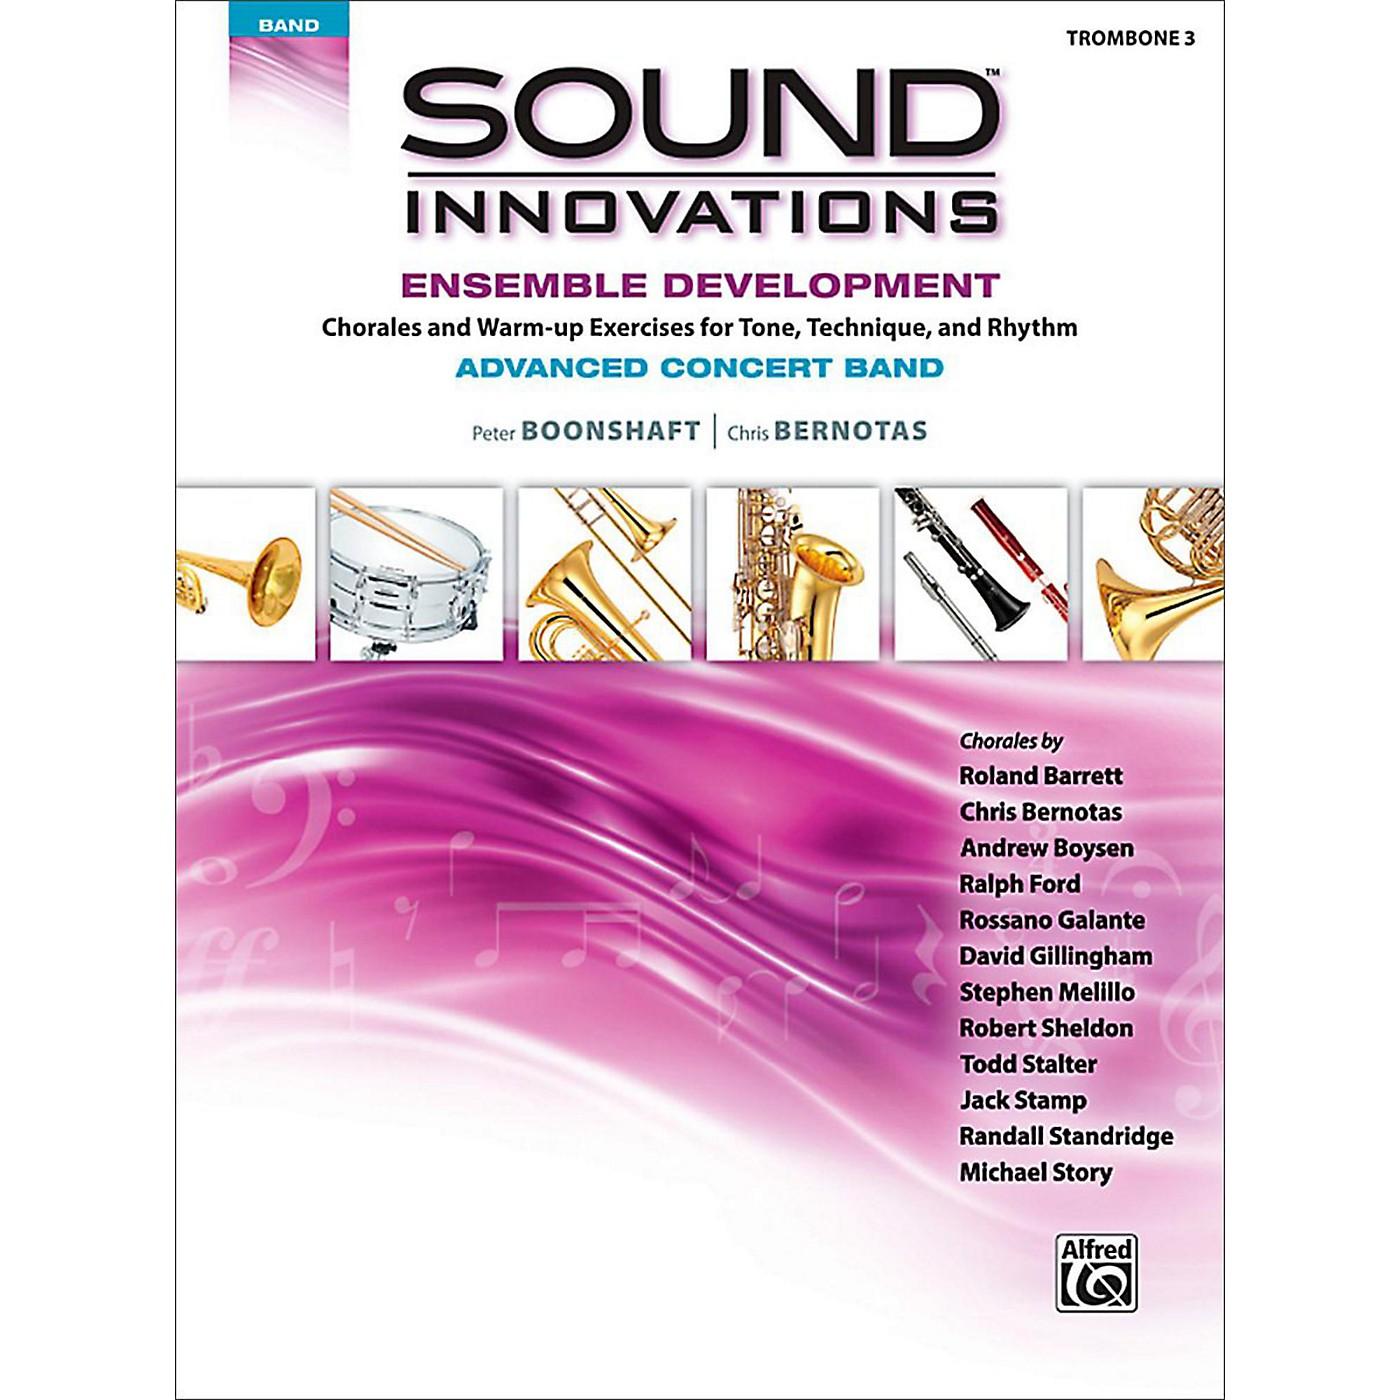 Alfred Sound Innovations Concert Band Ensemble Development Advanced Trombone 3 thumbnail